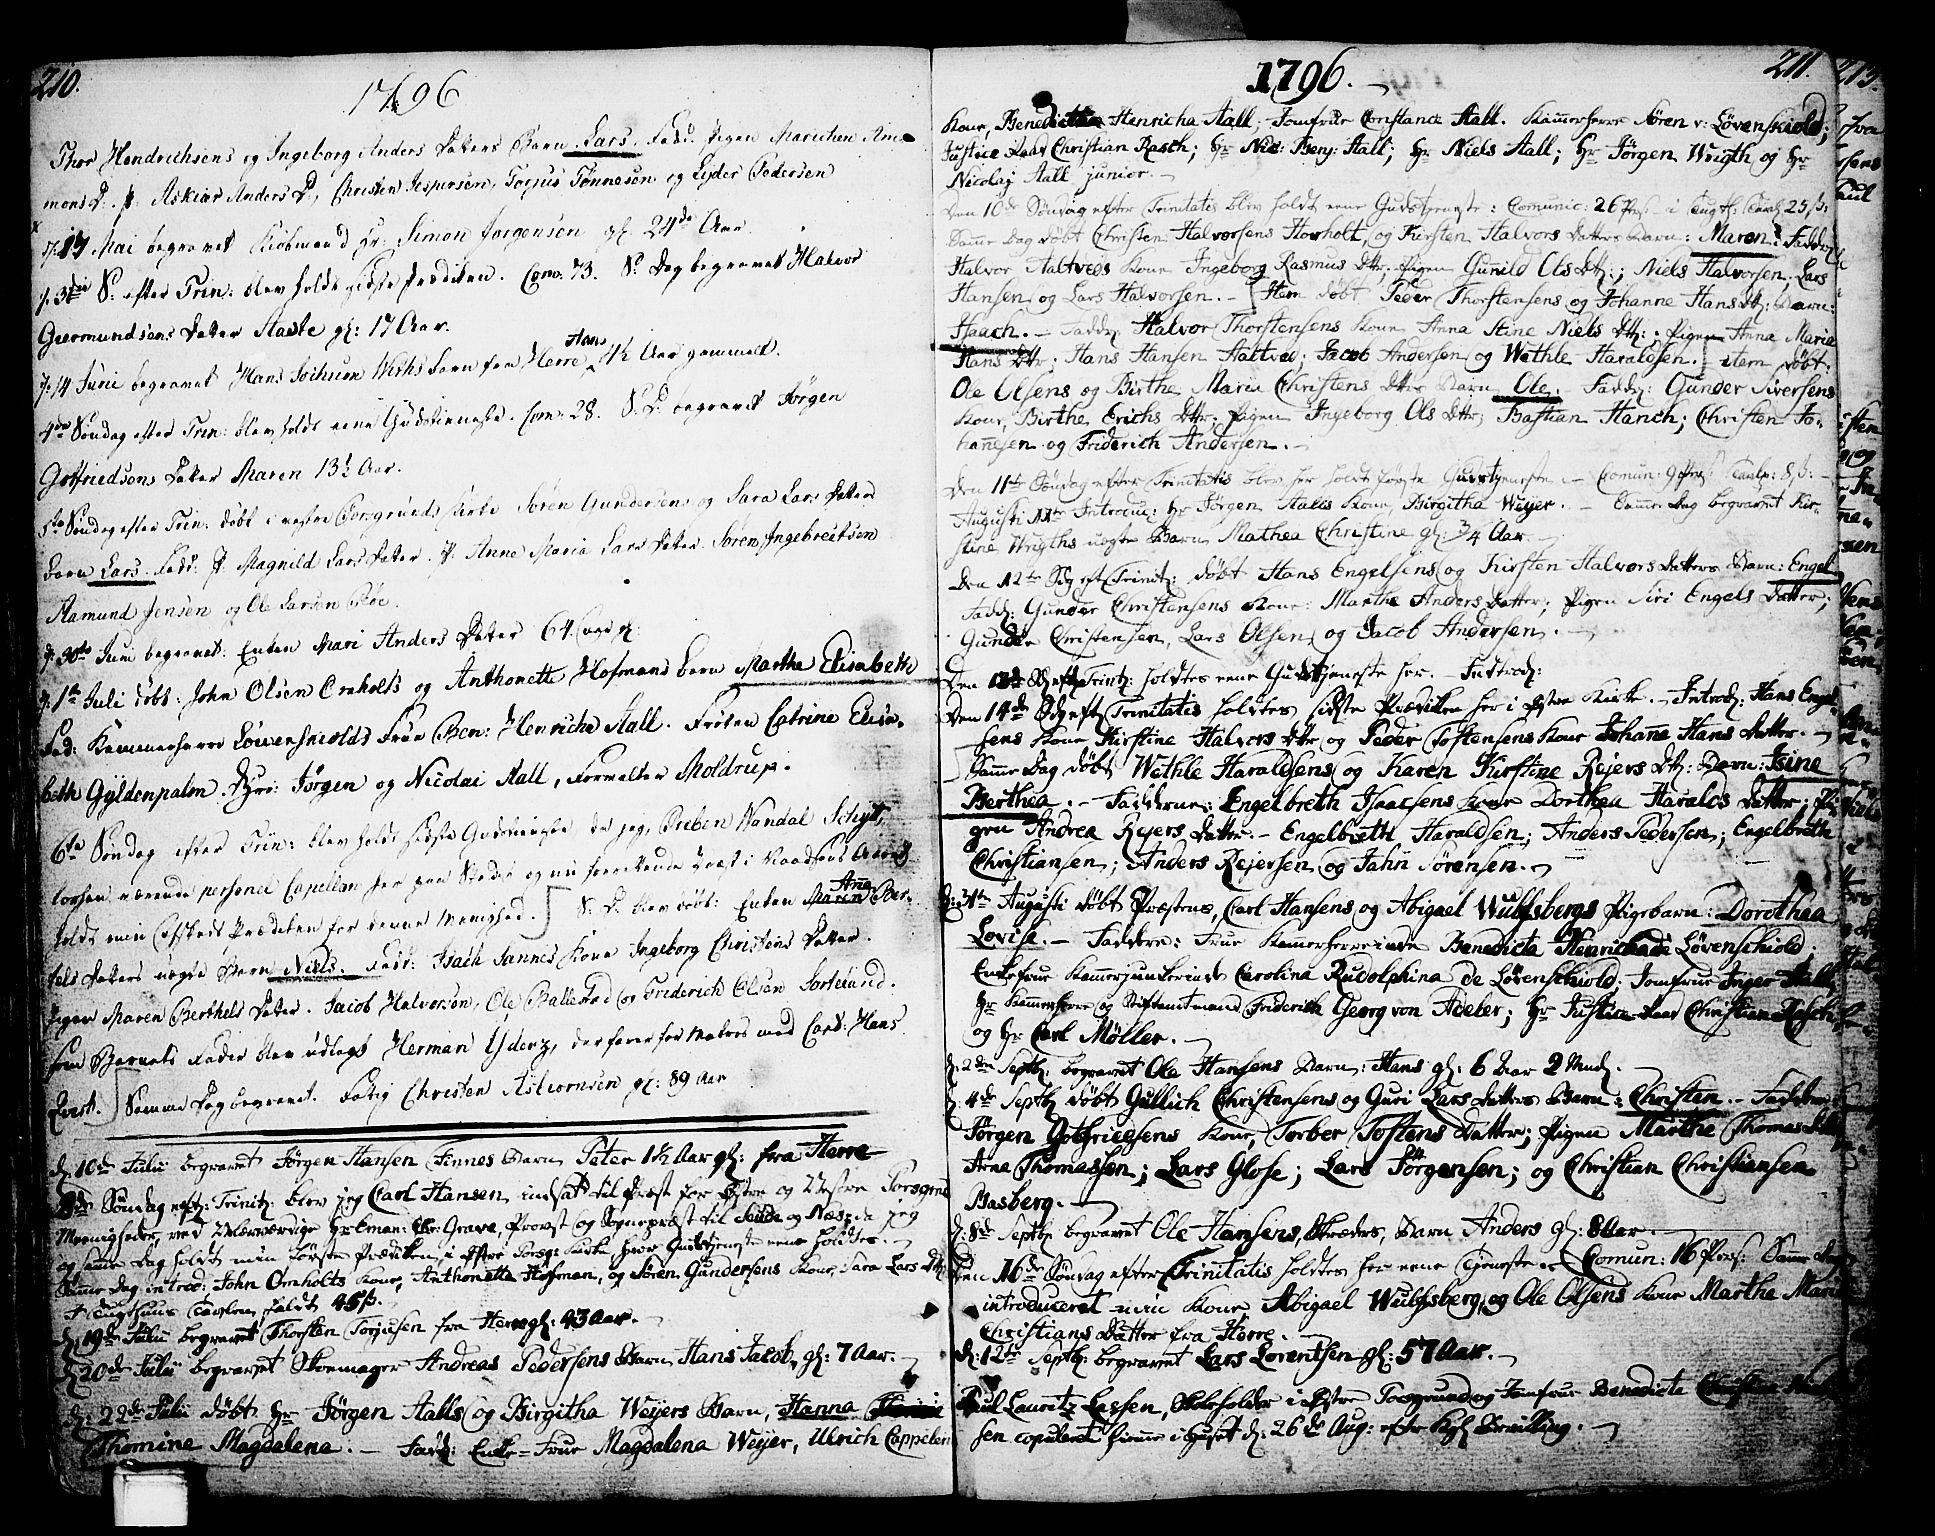 SAKO, Porsgrunn kirkebøker , F/Fa/L0002: Parish register (official) no. 2, 1764-1814, p. 210-211